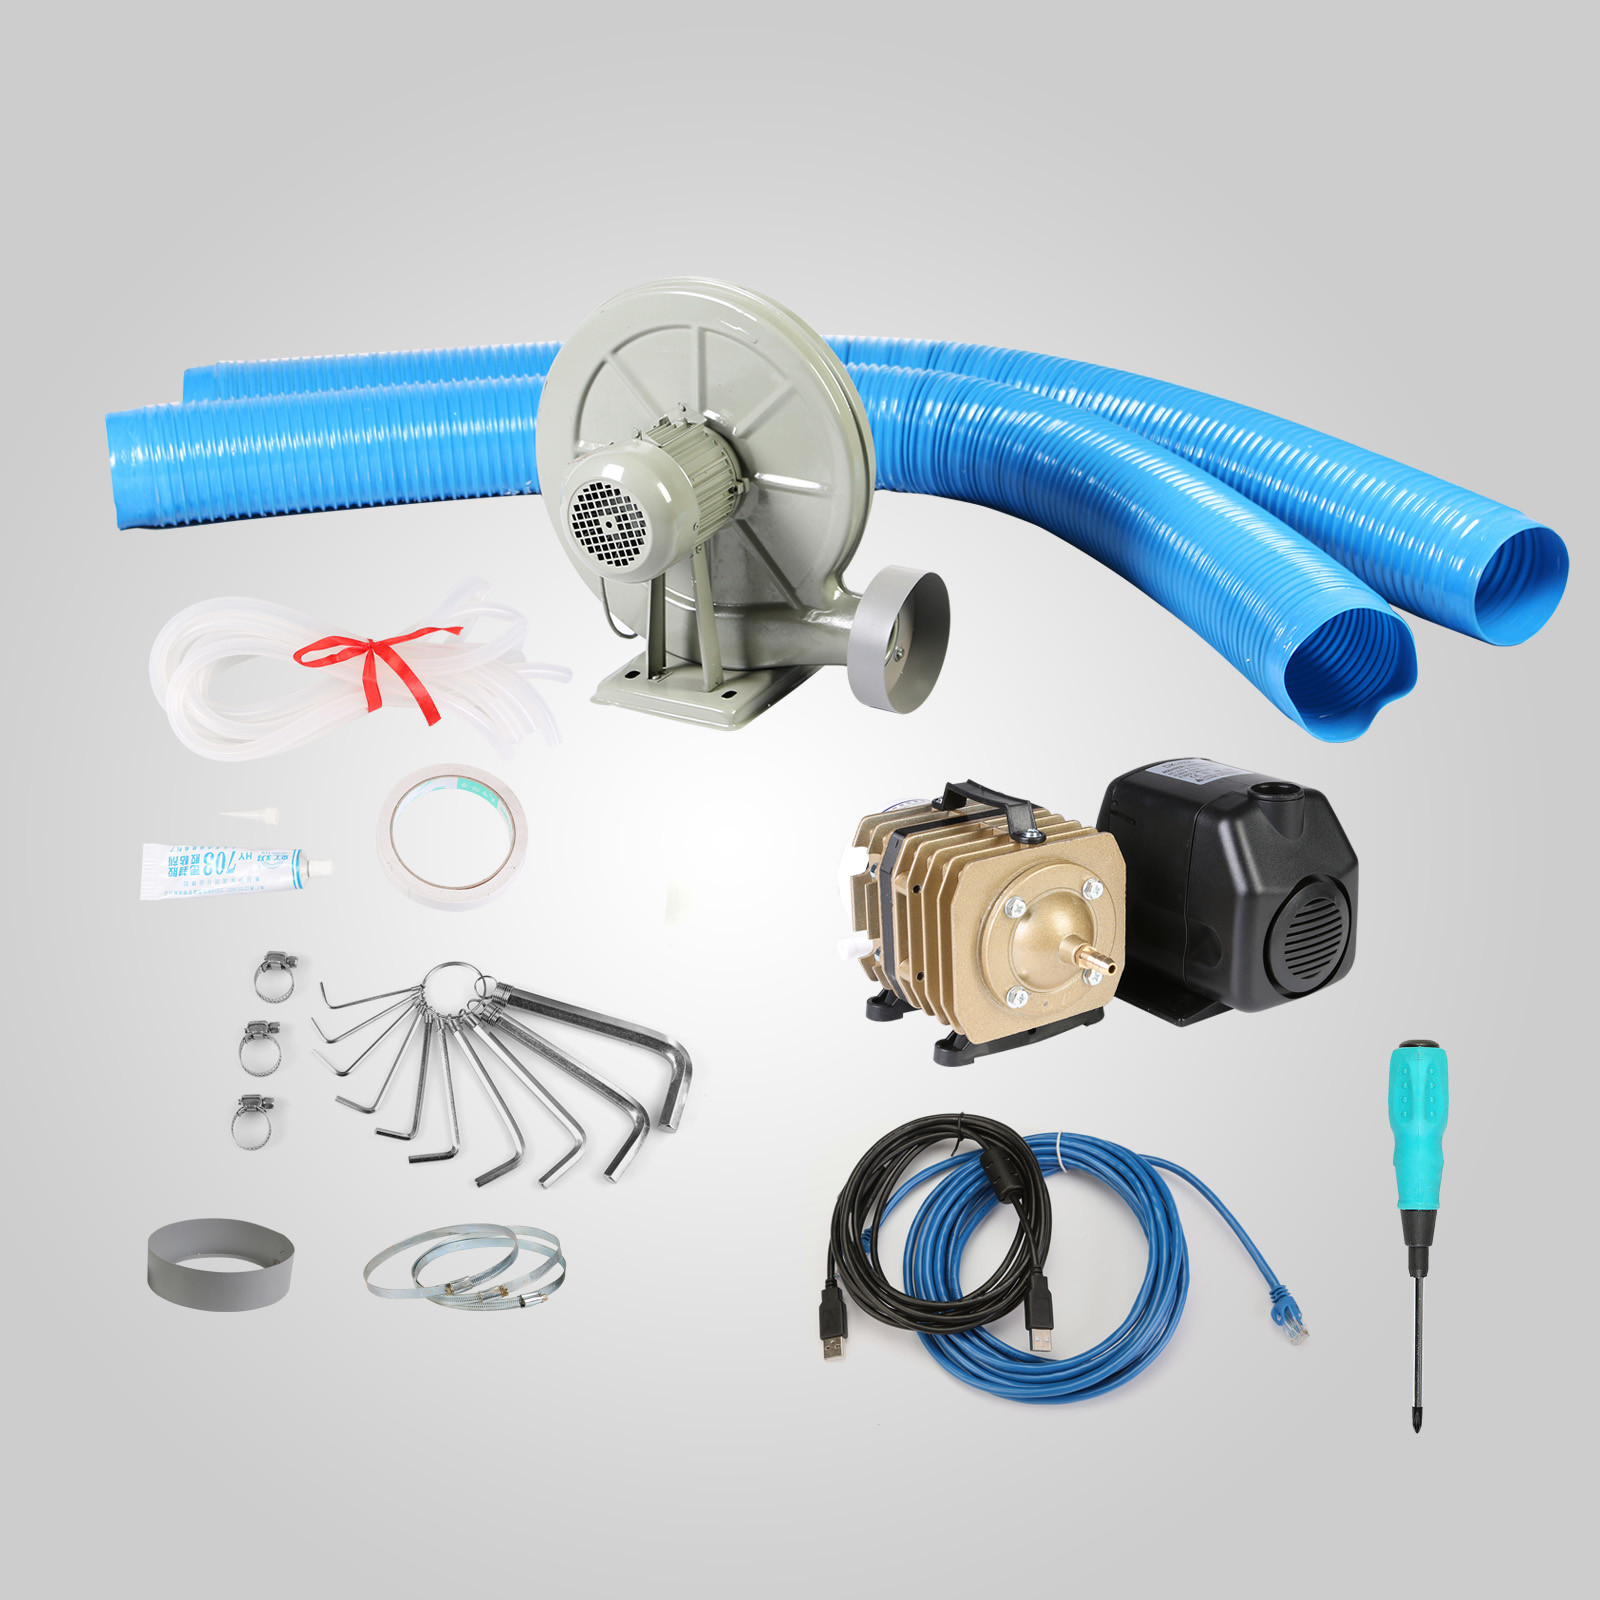 Macchina-per-Incisione-Laser-CO2-40-130W-Asse-Rotante-Tagliatrice-Incisore miniatura 80